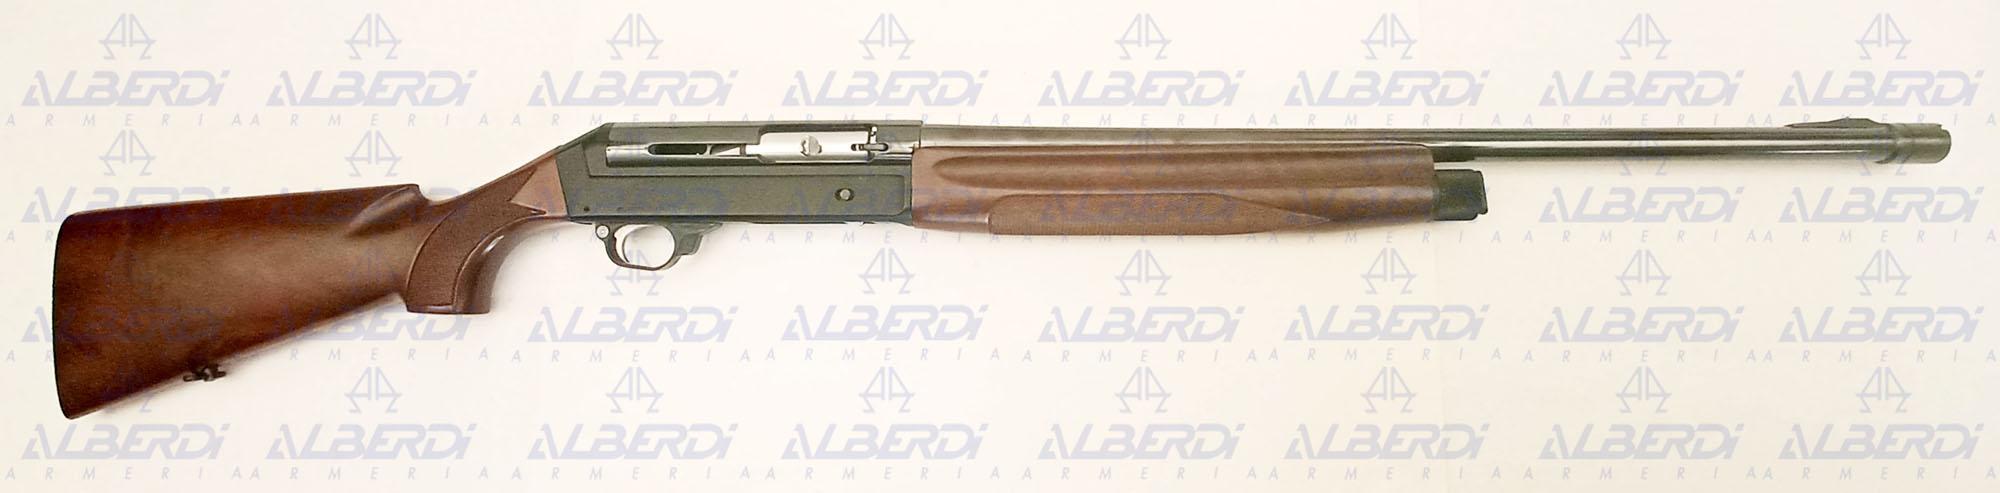 BENELLI modelo SL125 1 B A